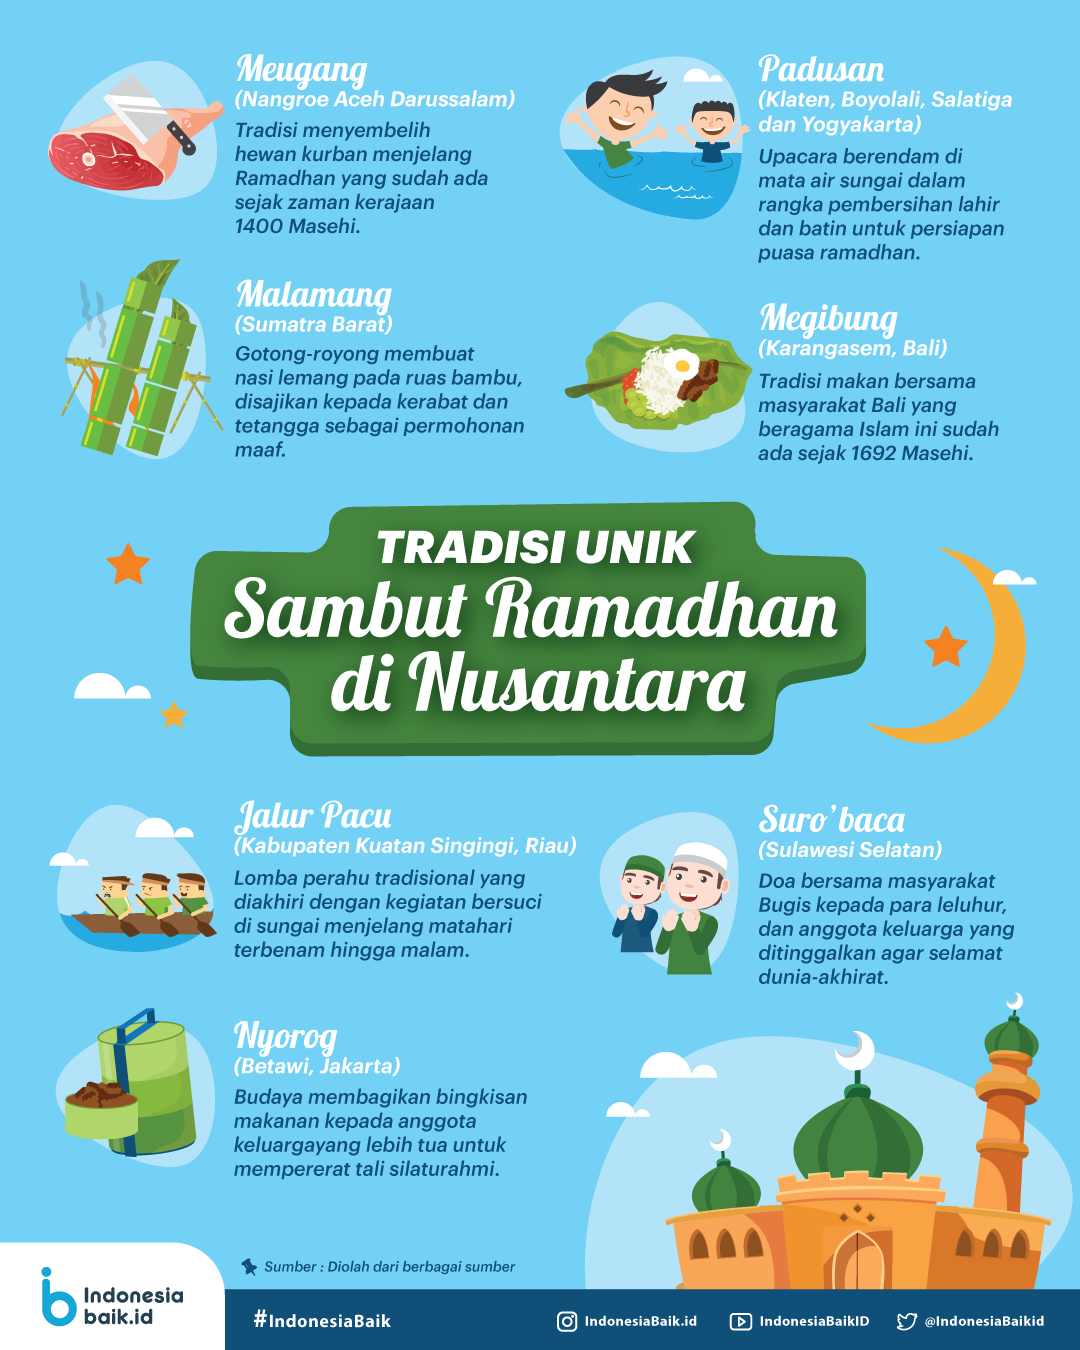 Tradisi Unik Sambut Ramadhan di Nusantara